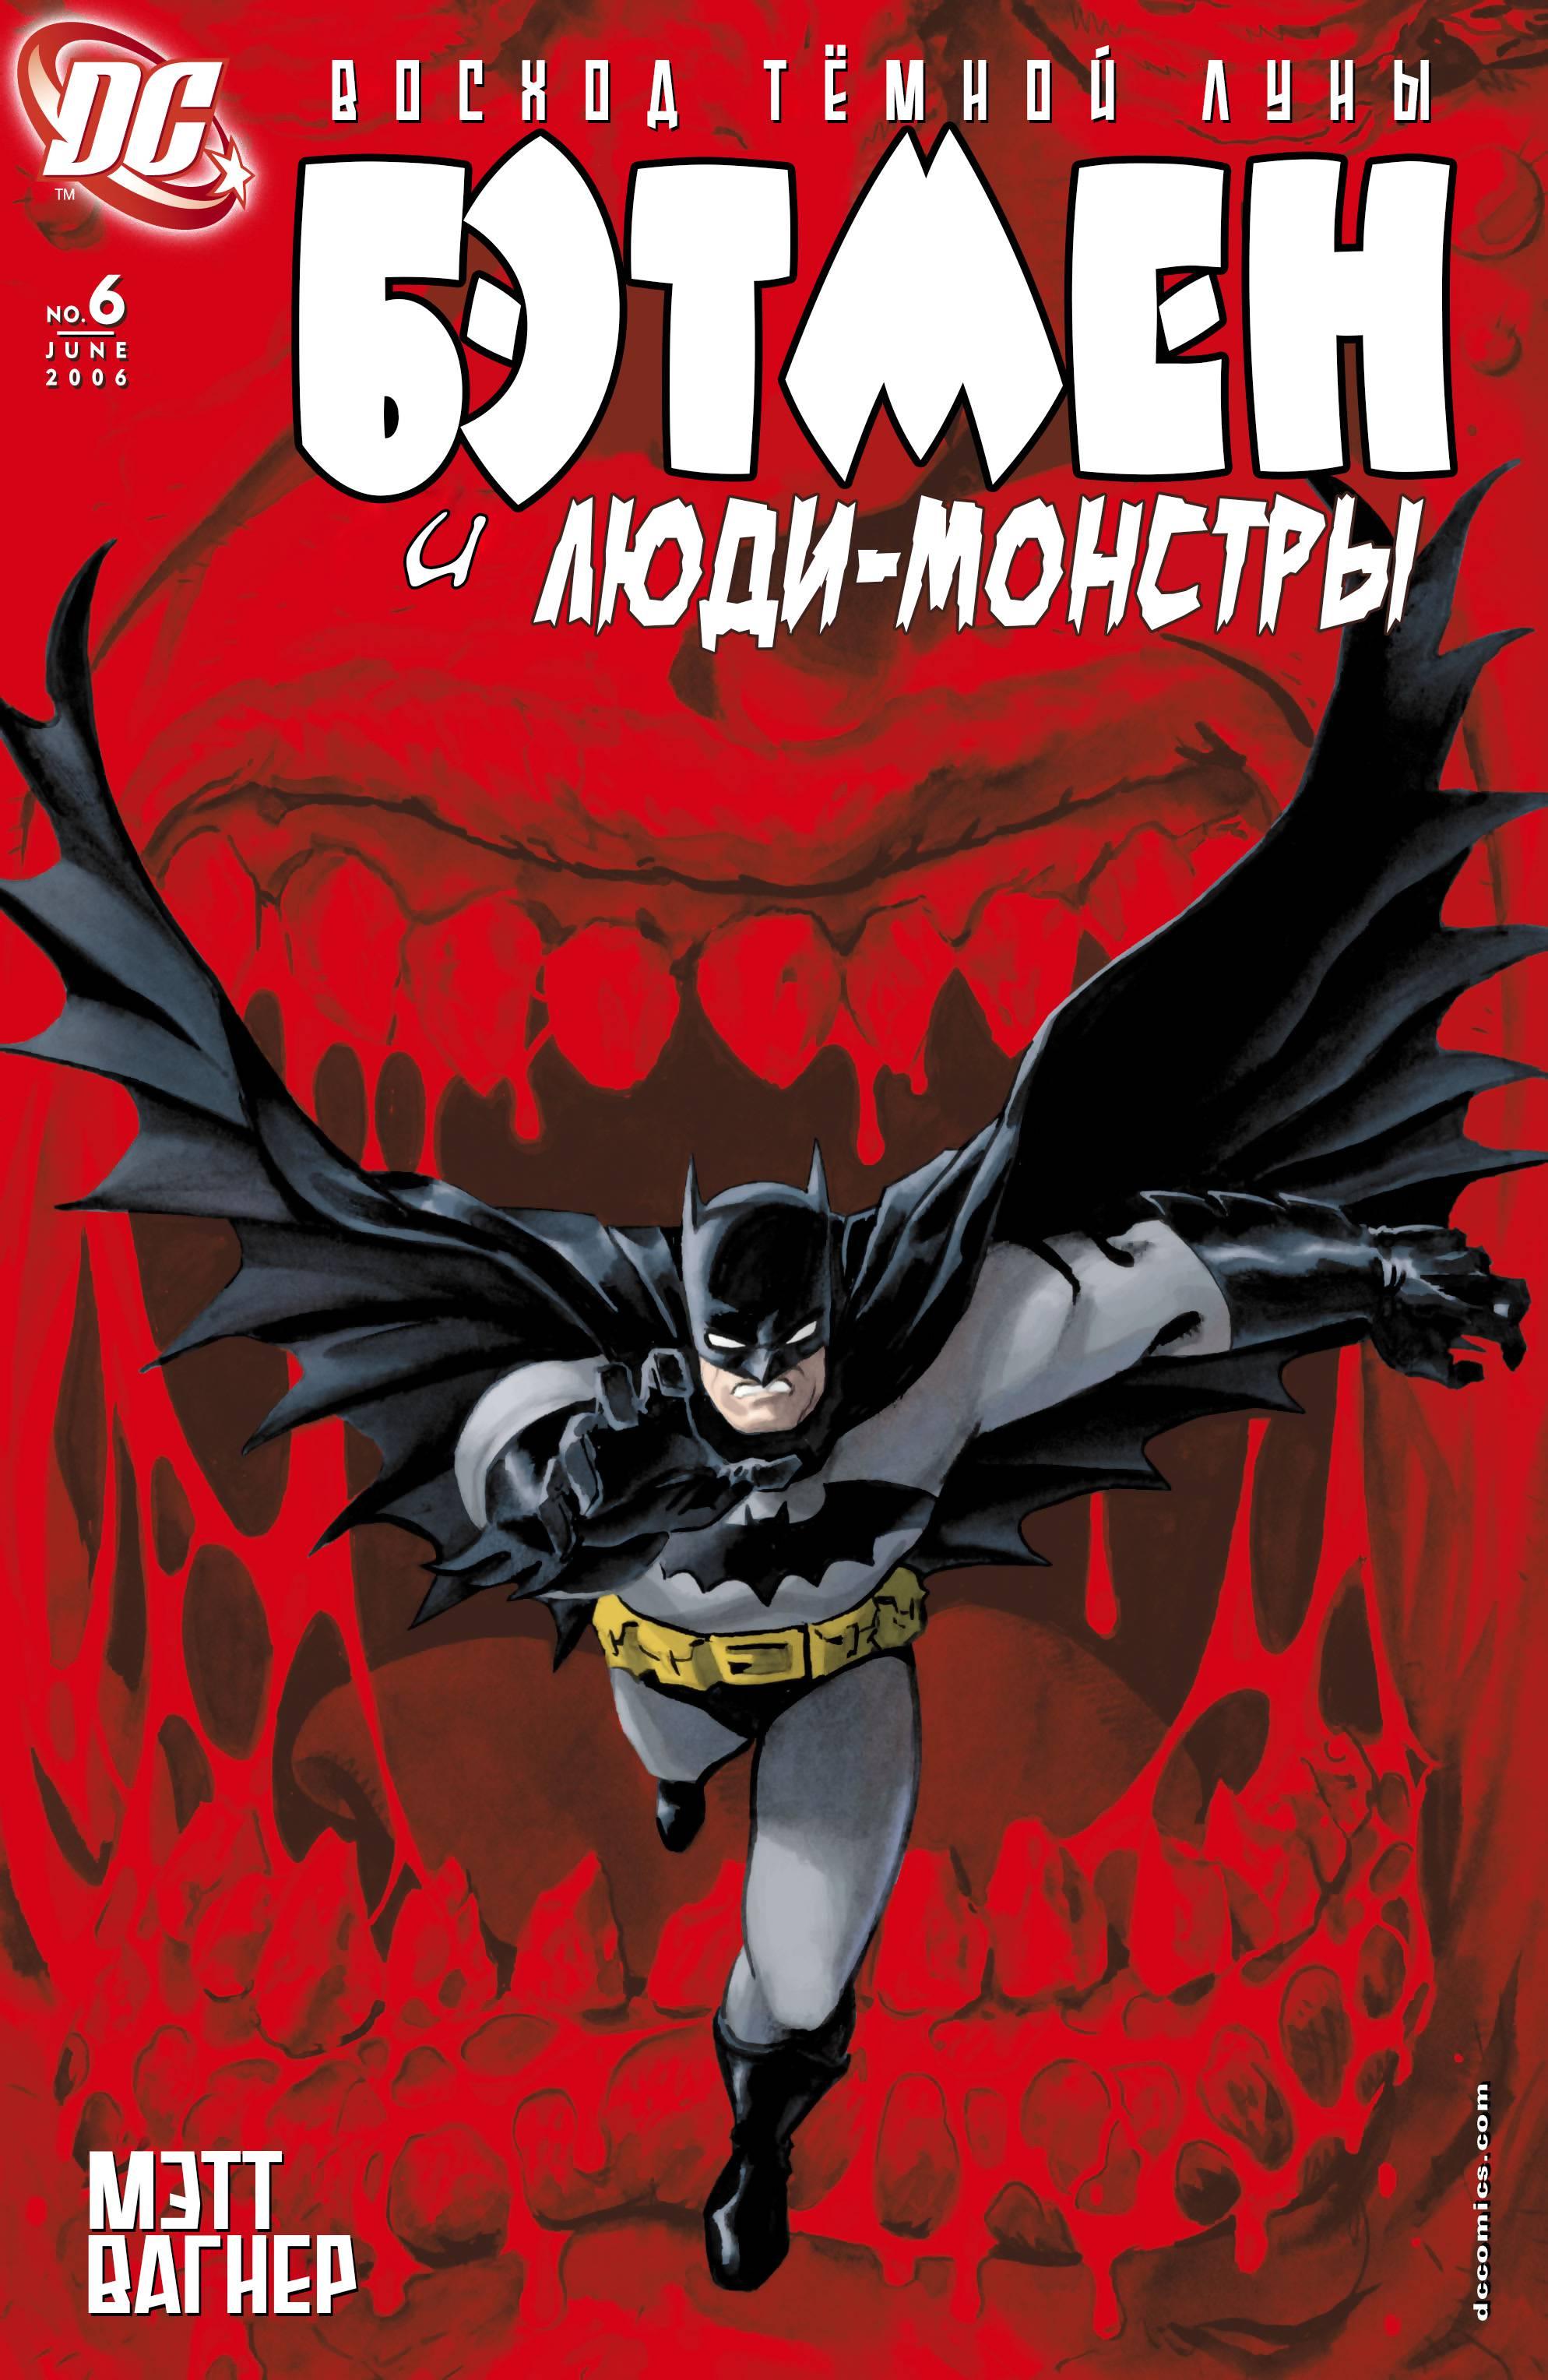 Бэтмен и Люди-Монстры №6 онлайн